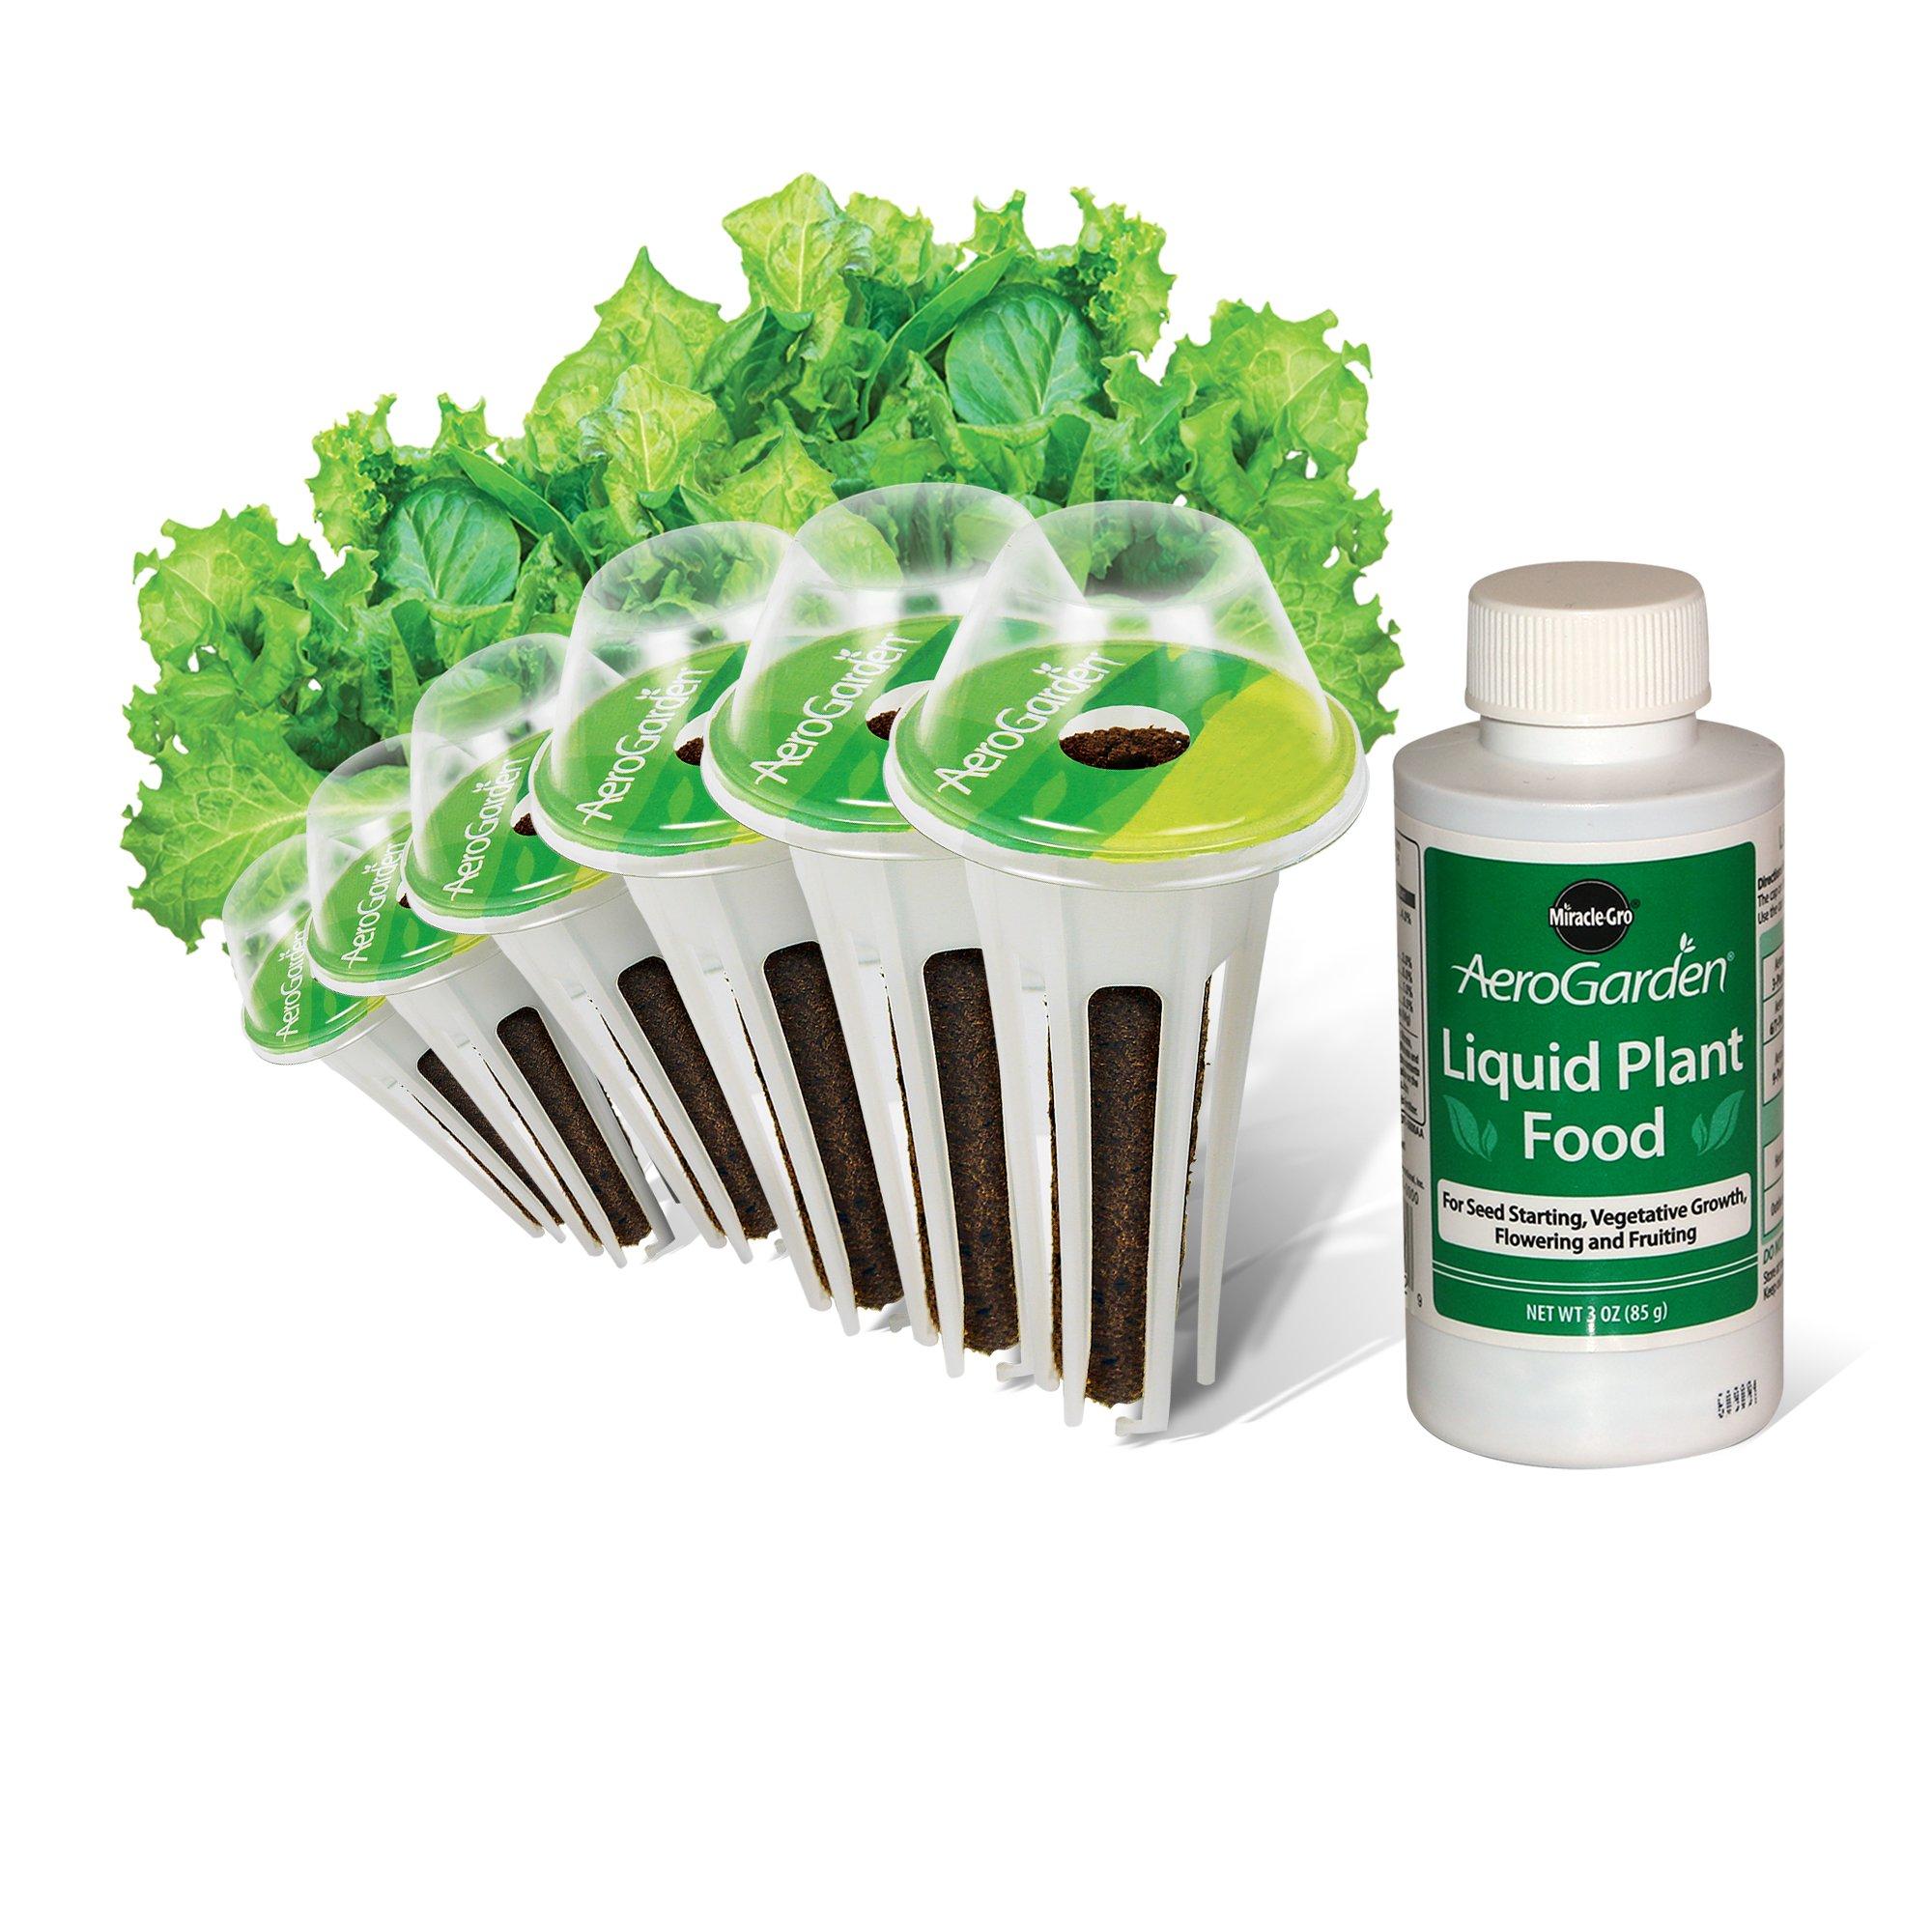 AeroGarden Salad Greens Mix Seed Pod Kit by AeroGarden